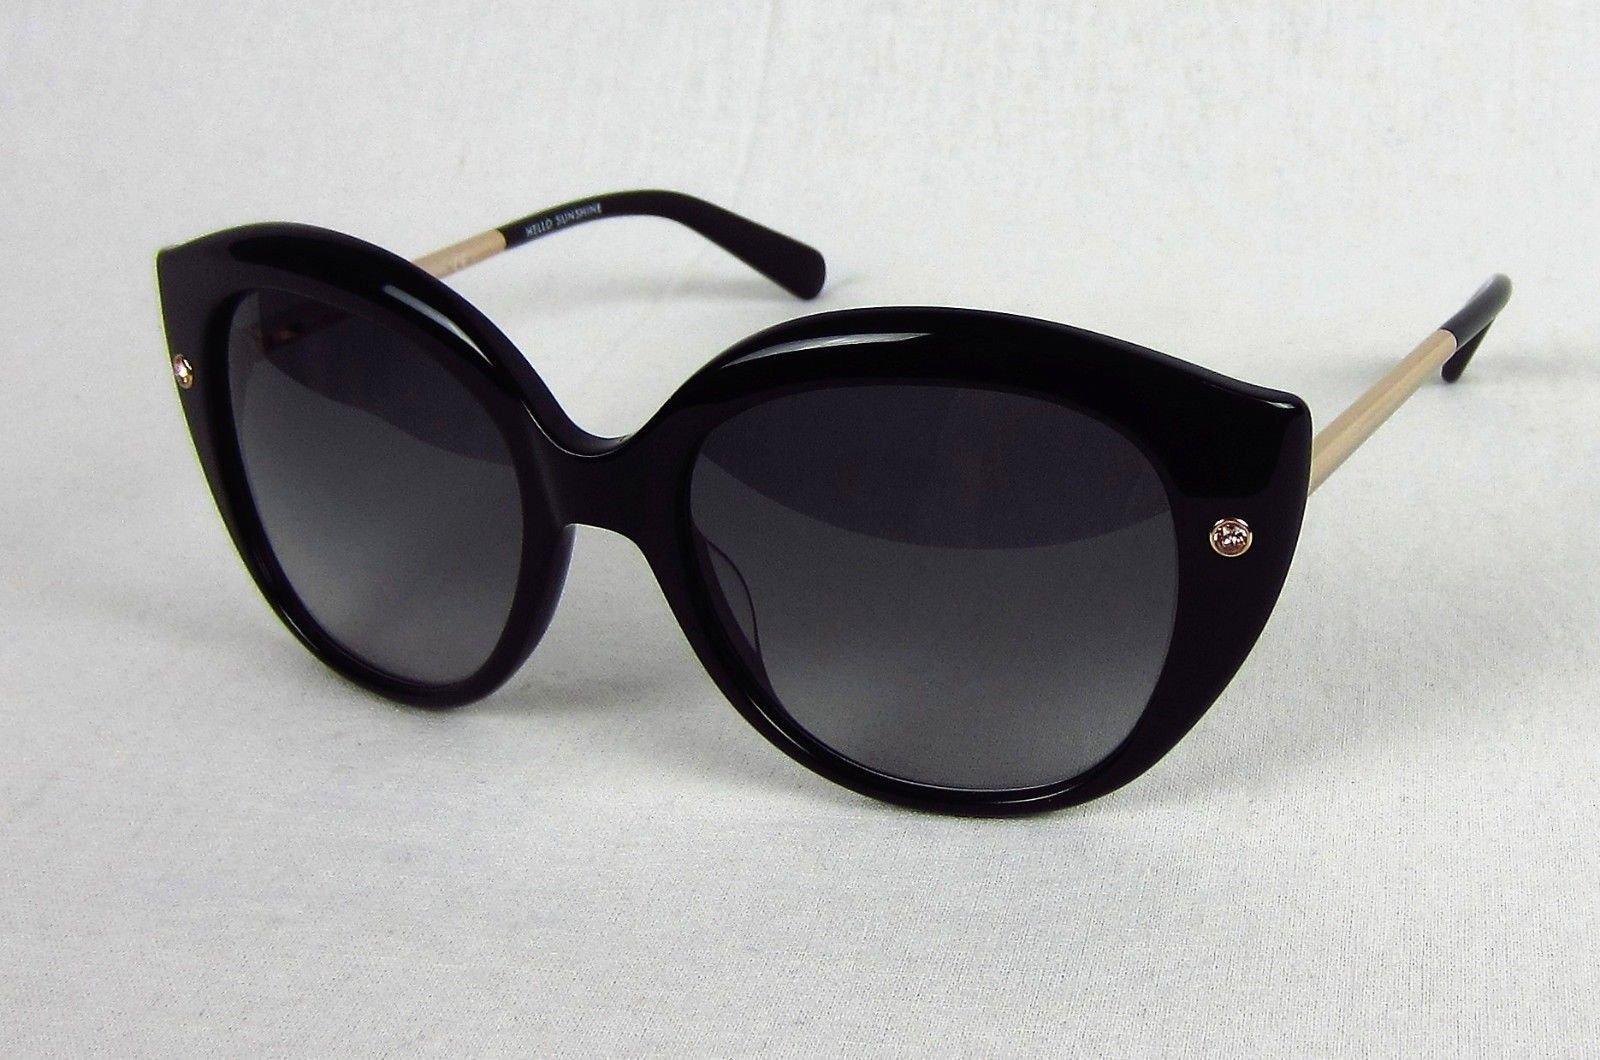 3fa2638e7e07 Details about Kate Spade Kaelee/S Sunglasses Black Cat Eye Frame 0807-F8  Pink Rhinestone Gold